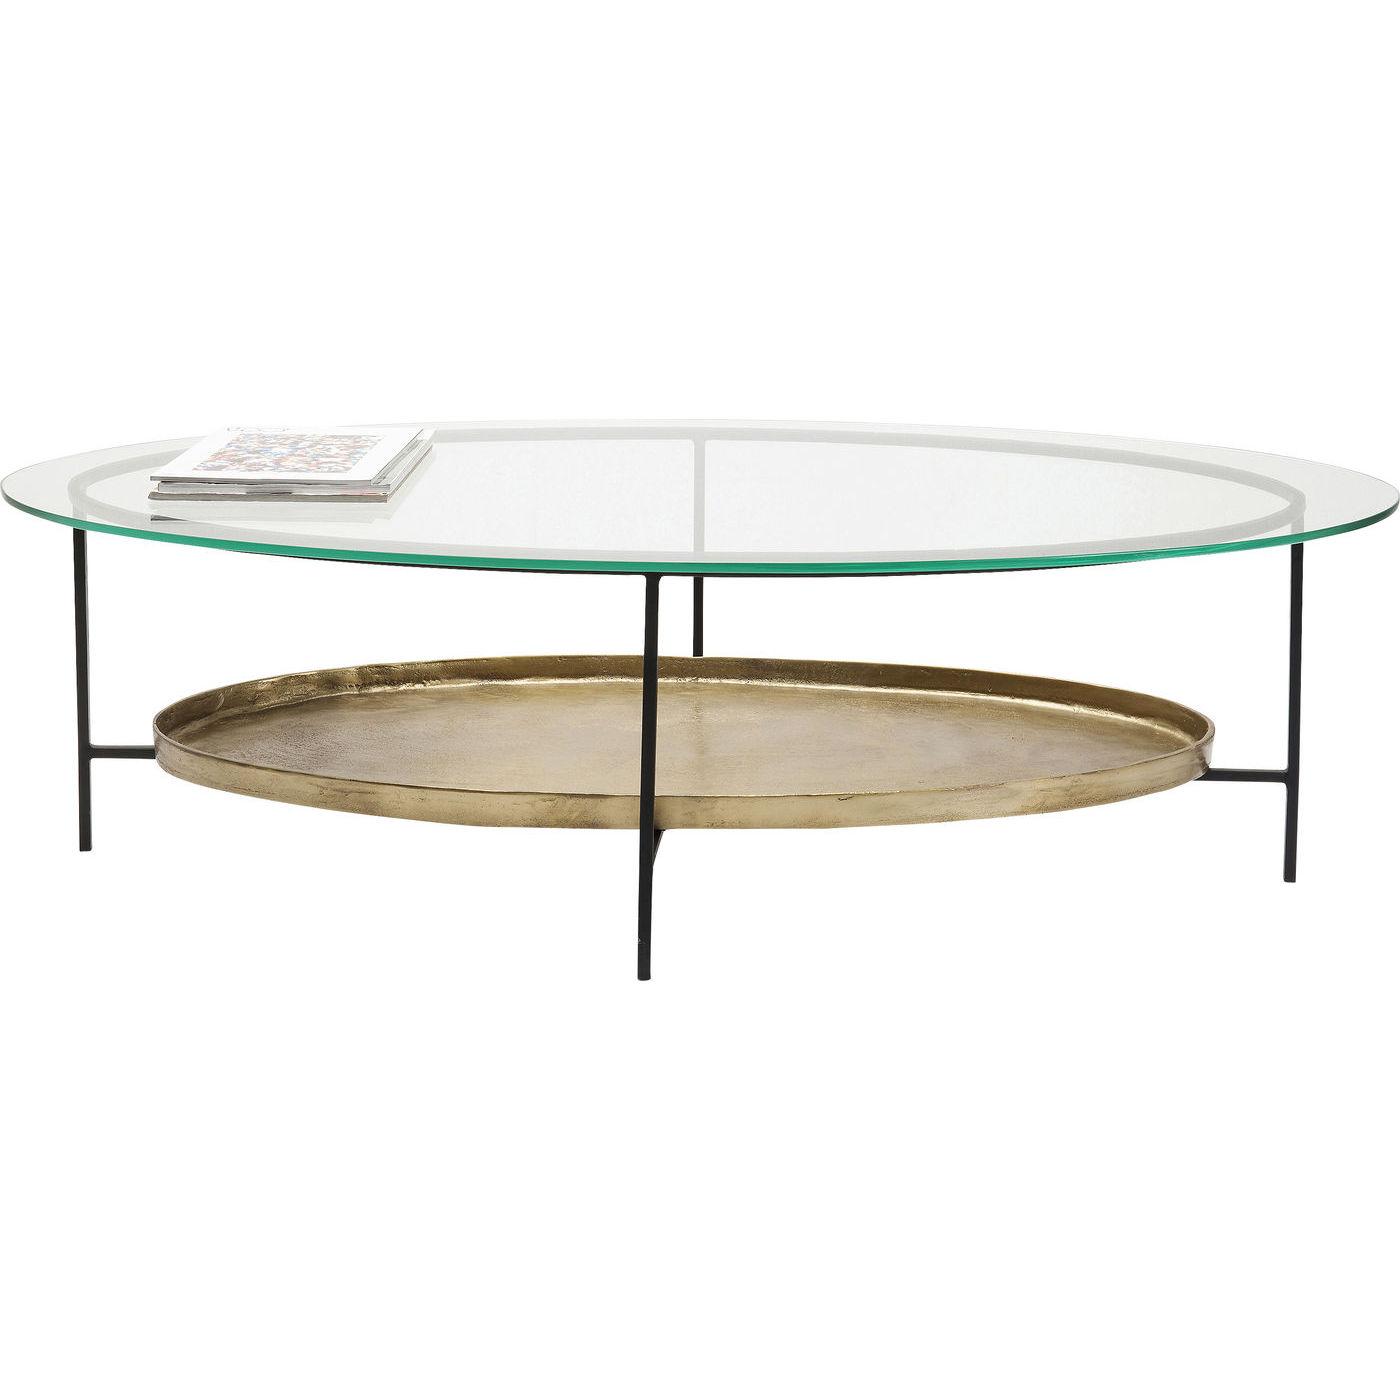 KARE DESIGN Secrets sofabord - klart glas/sort stål/messing aluminium, oval, m. 1 hylde (120x60)